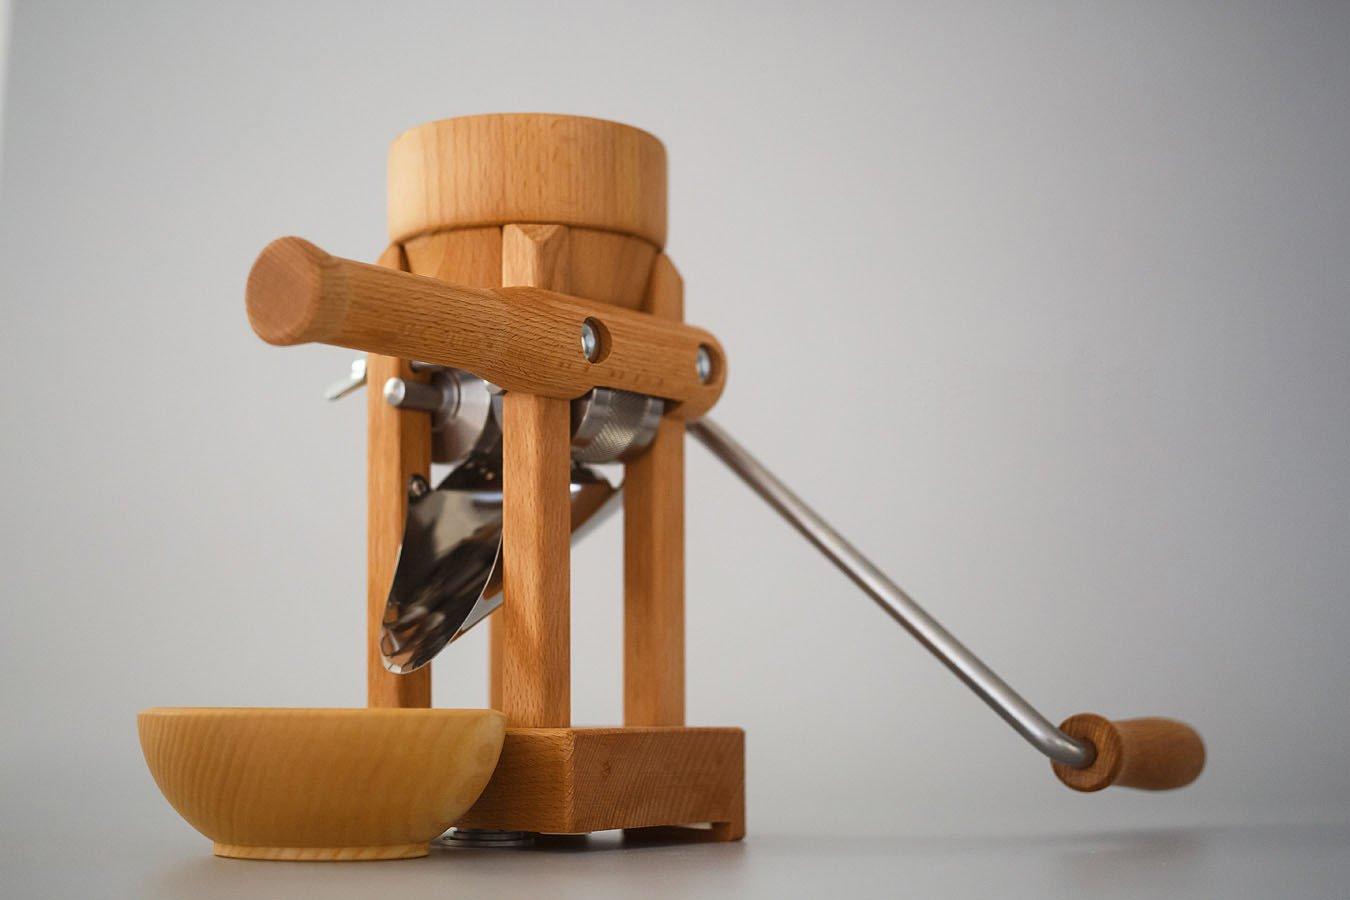 Handle for Eschenfelder Flaker table models